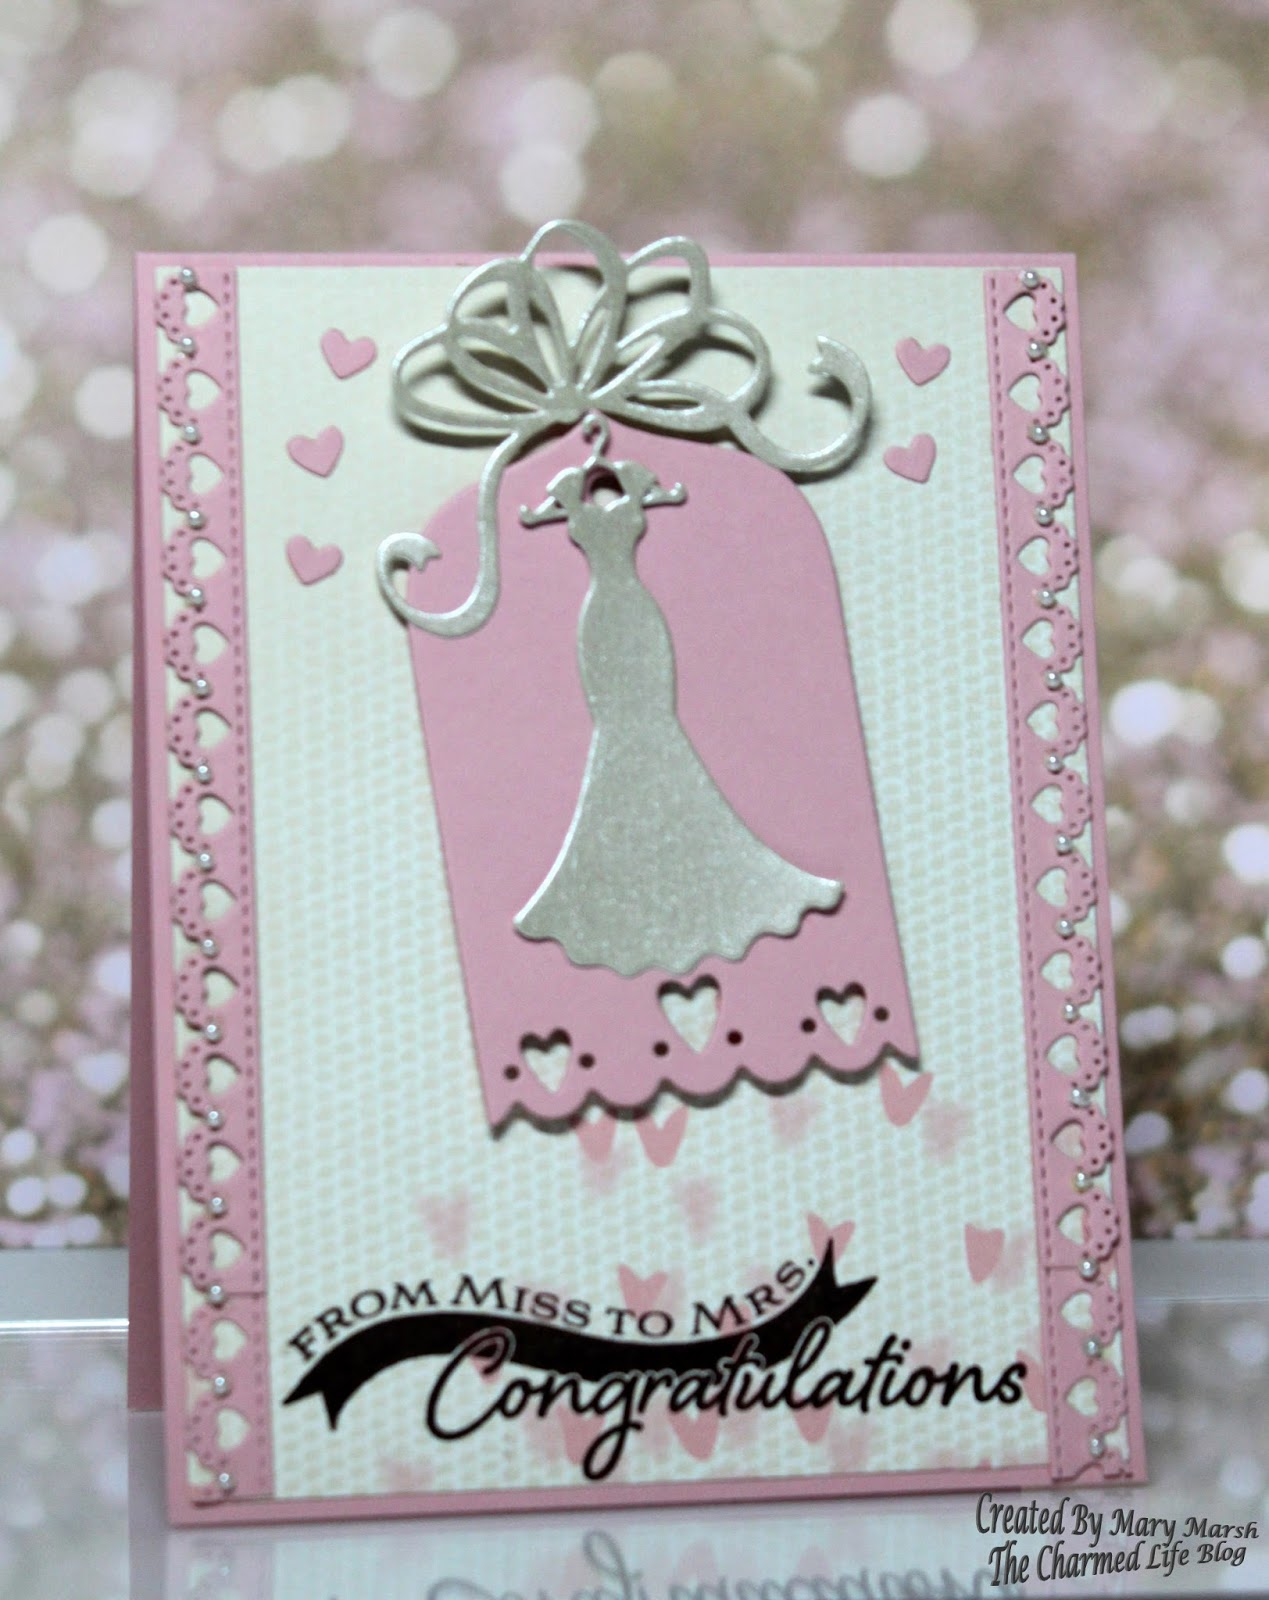 Cottageblog miss to mrs bridal shower card miss to mrs bridal shower card kristyandbryce Image collections